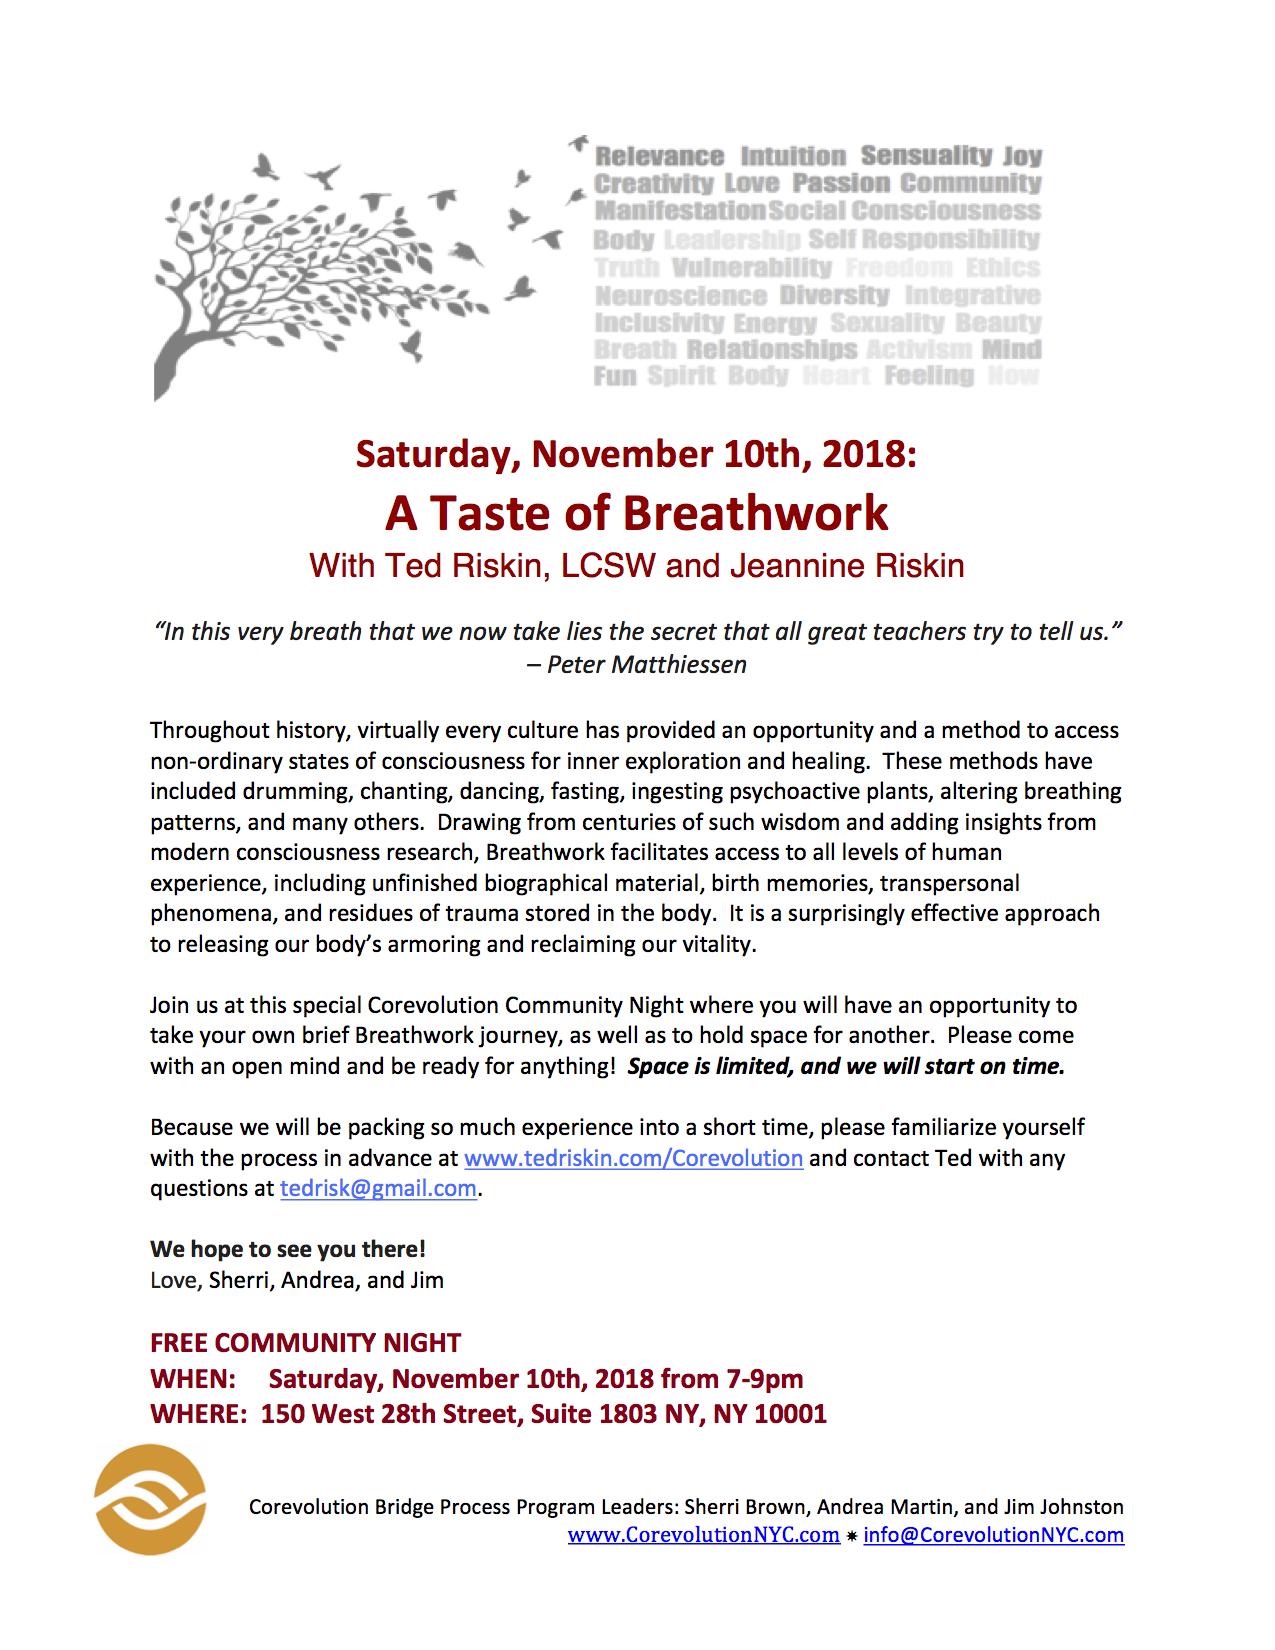 Breathwork Community Night flyer 11_10_18.jpg